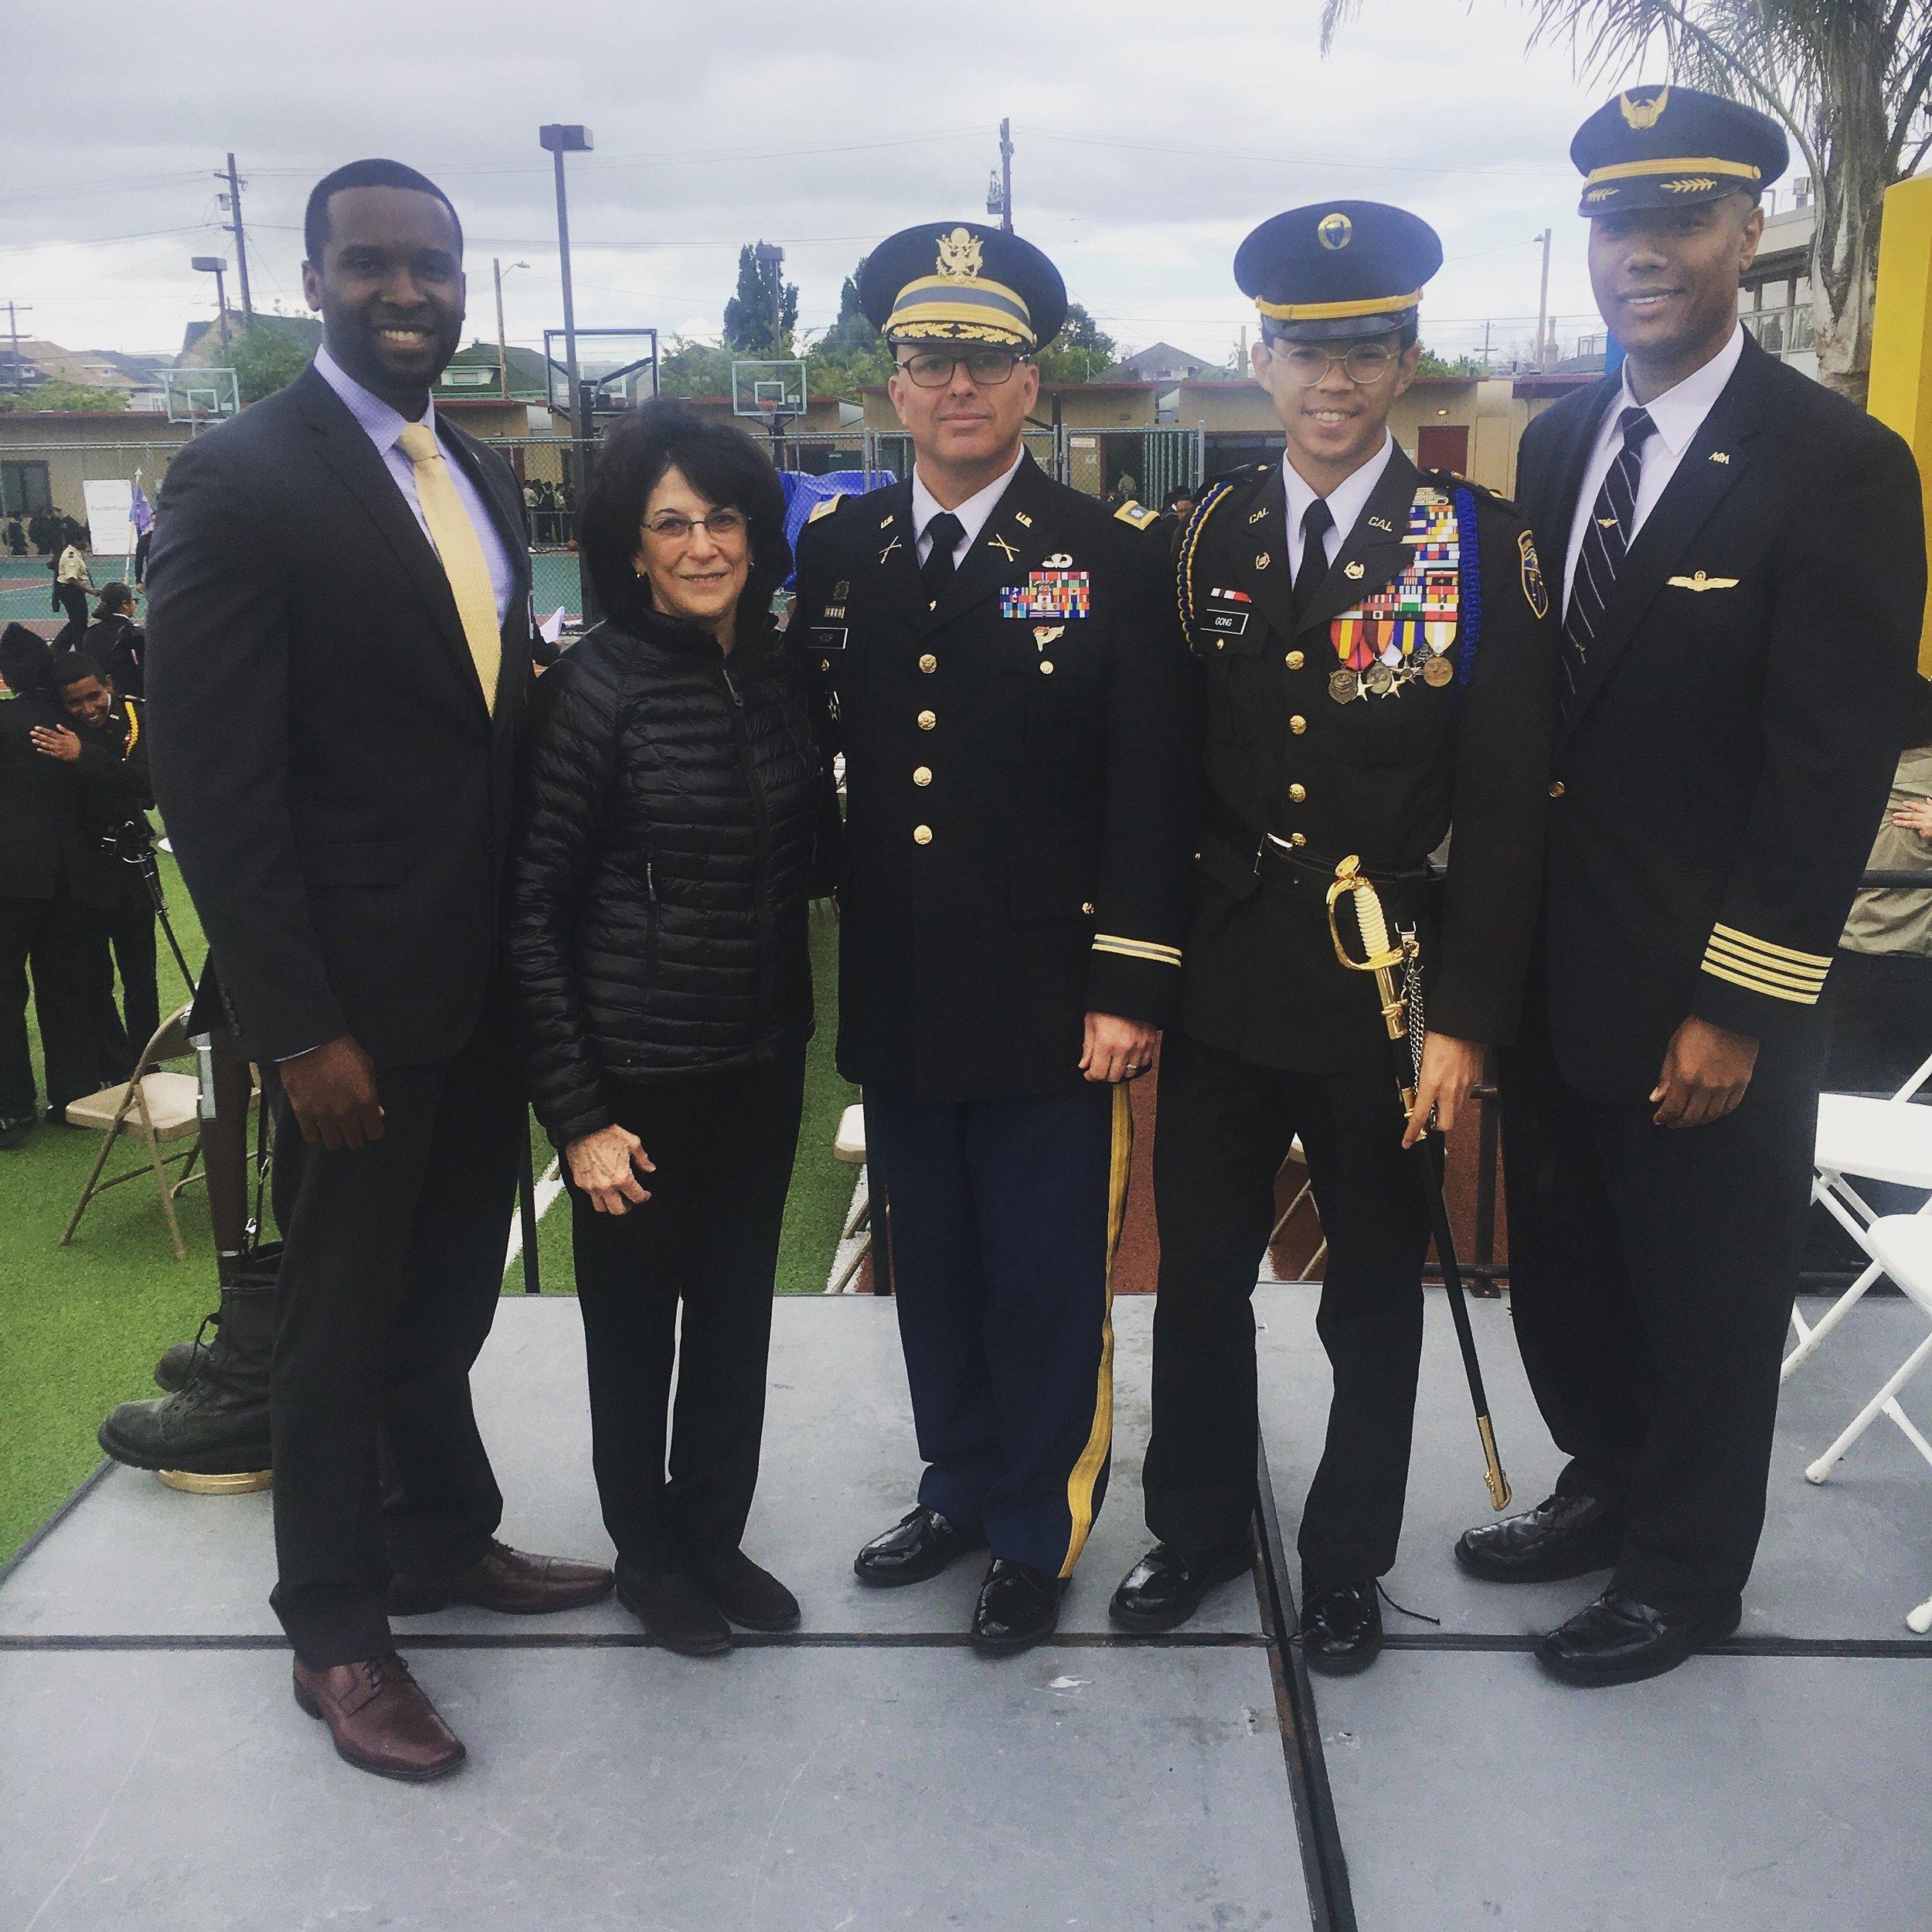 Jerry Varnado '07, Nina Leslie, LTC Ken Coop (OMI Commandant), Cadet Gong, Guest Speaker